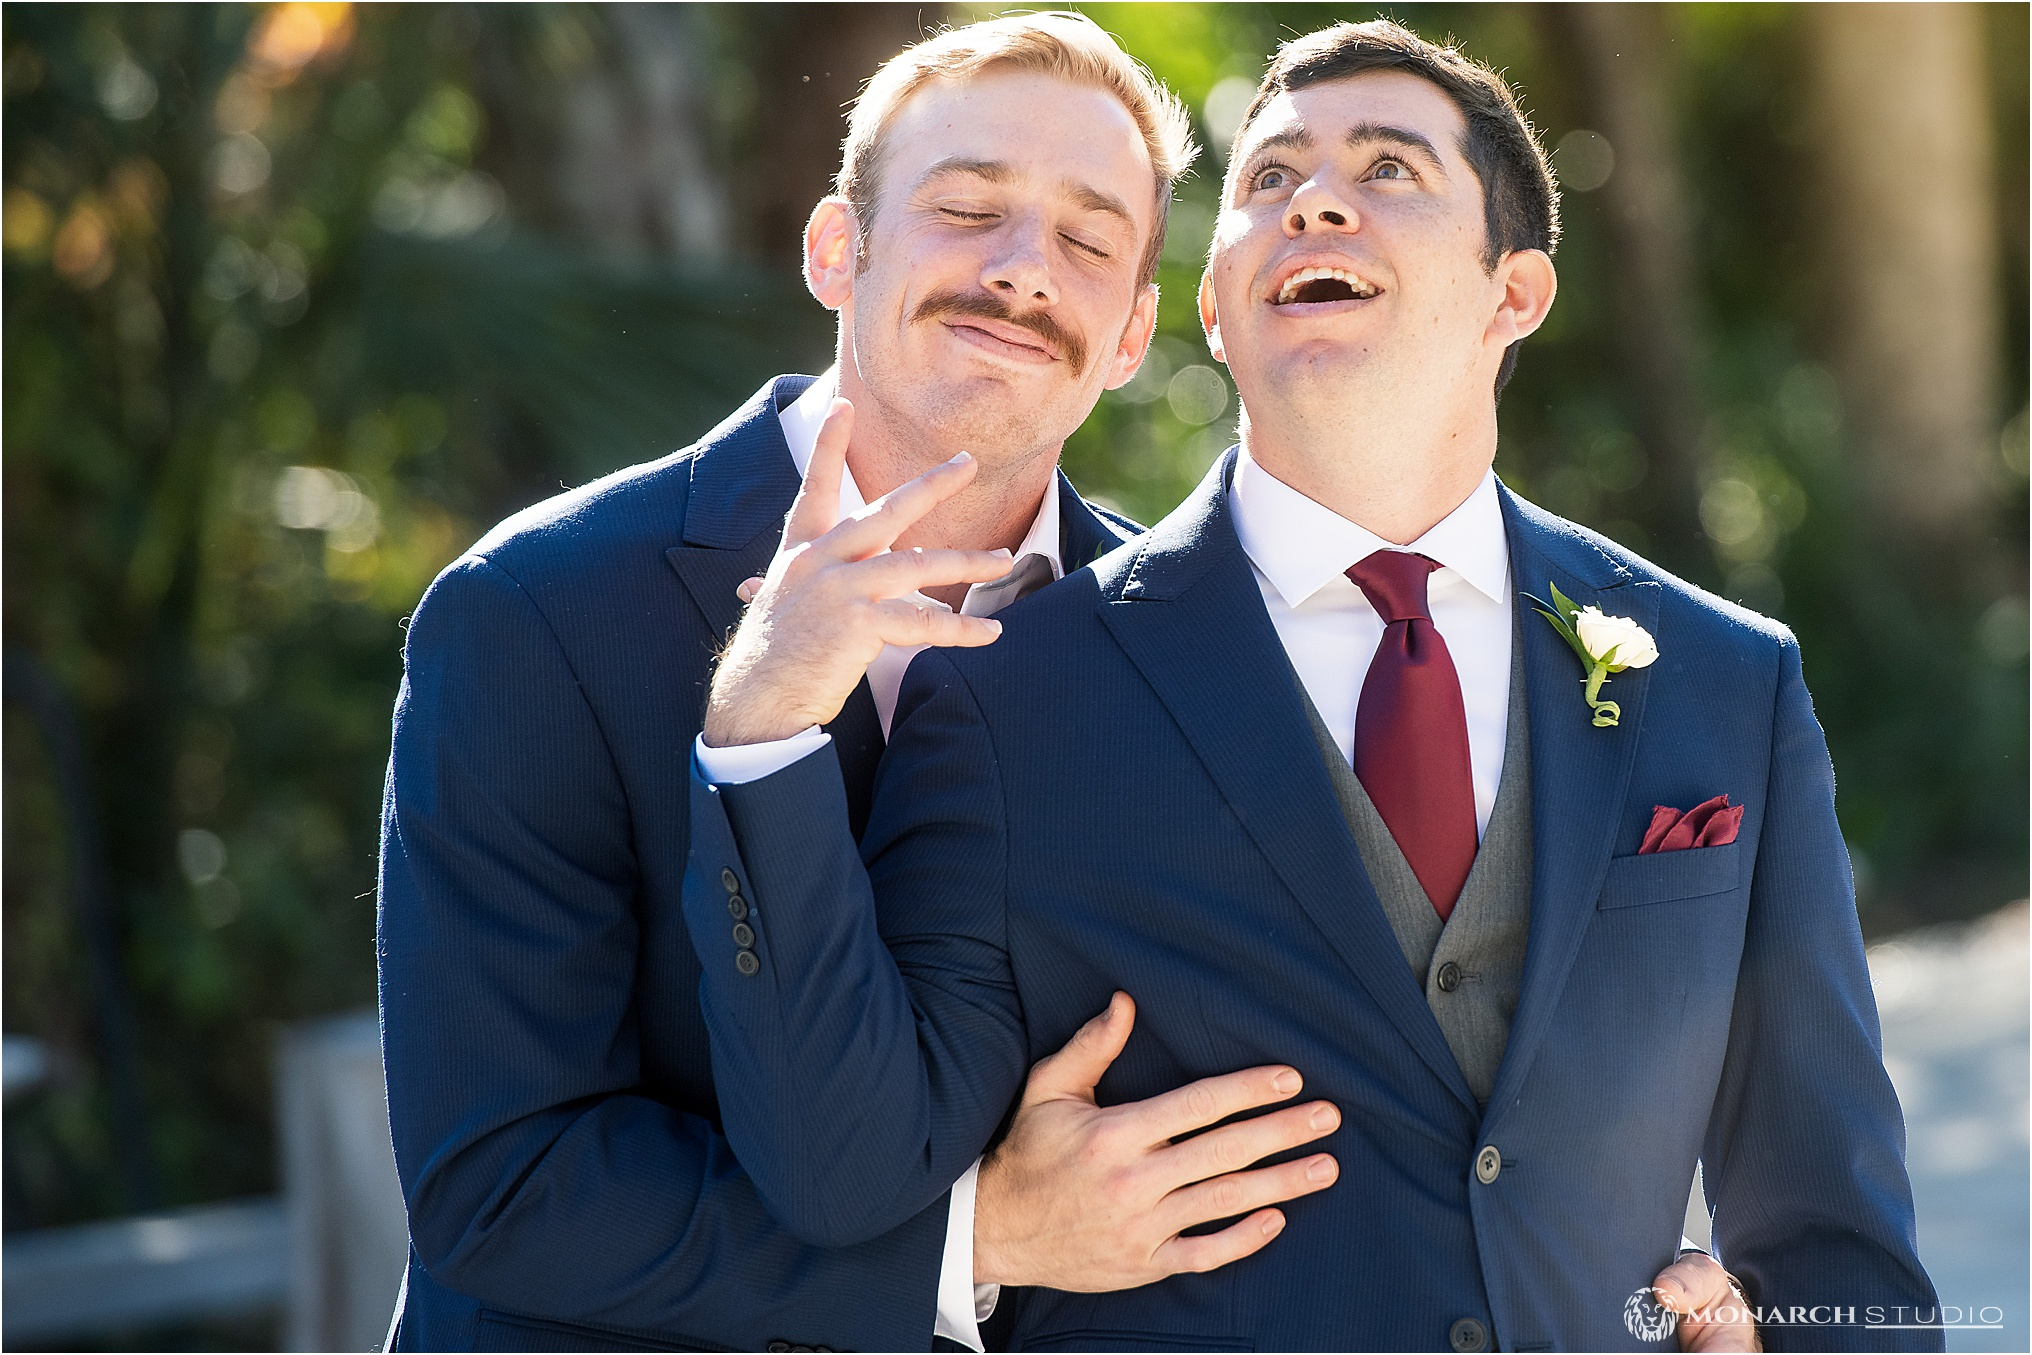 Wedding-photographer-in-sanford-florida-natural-wedding-006.jpg